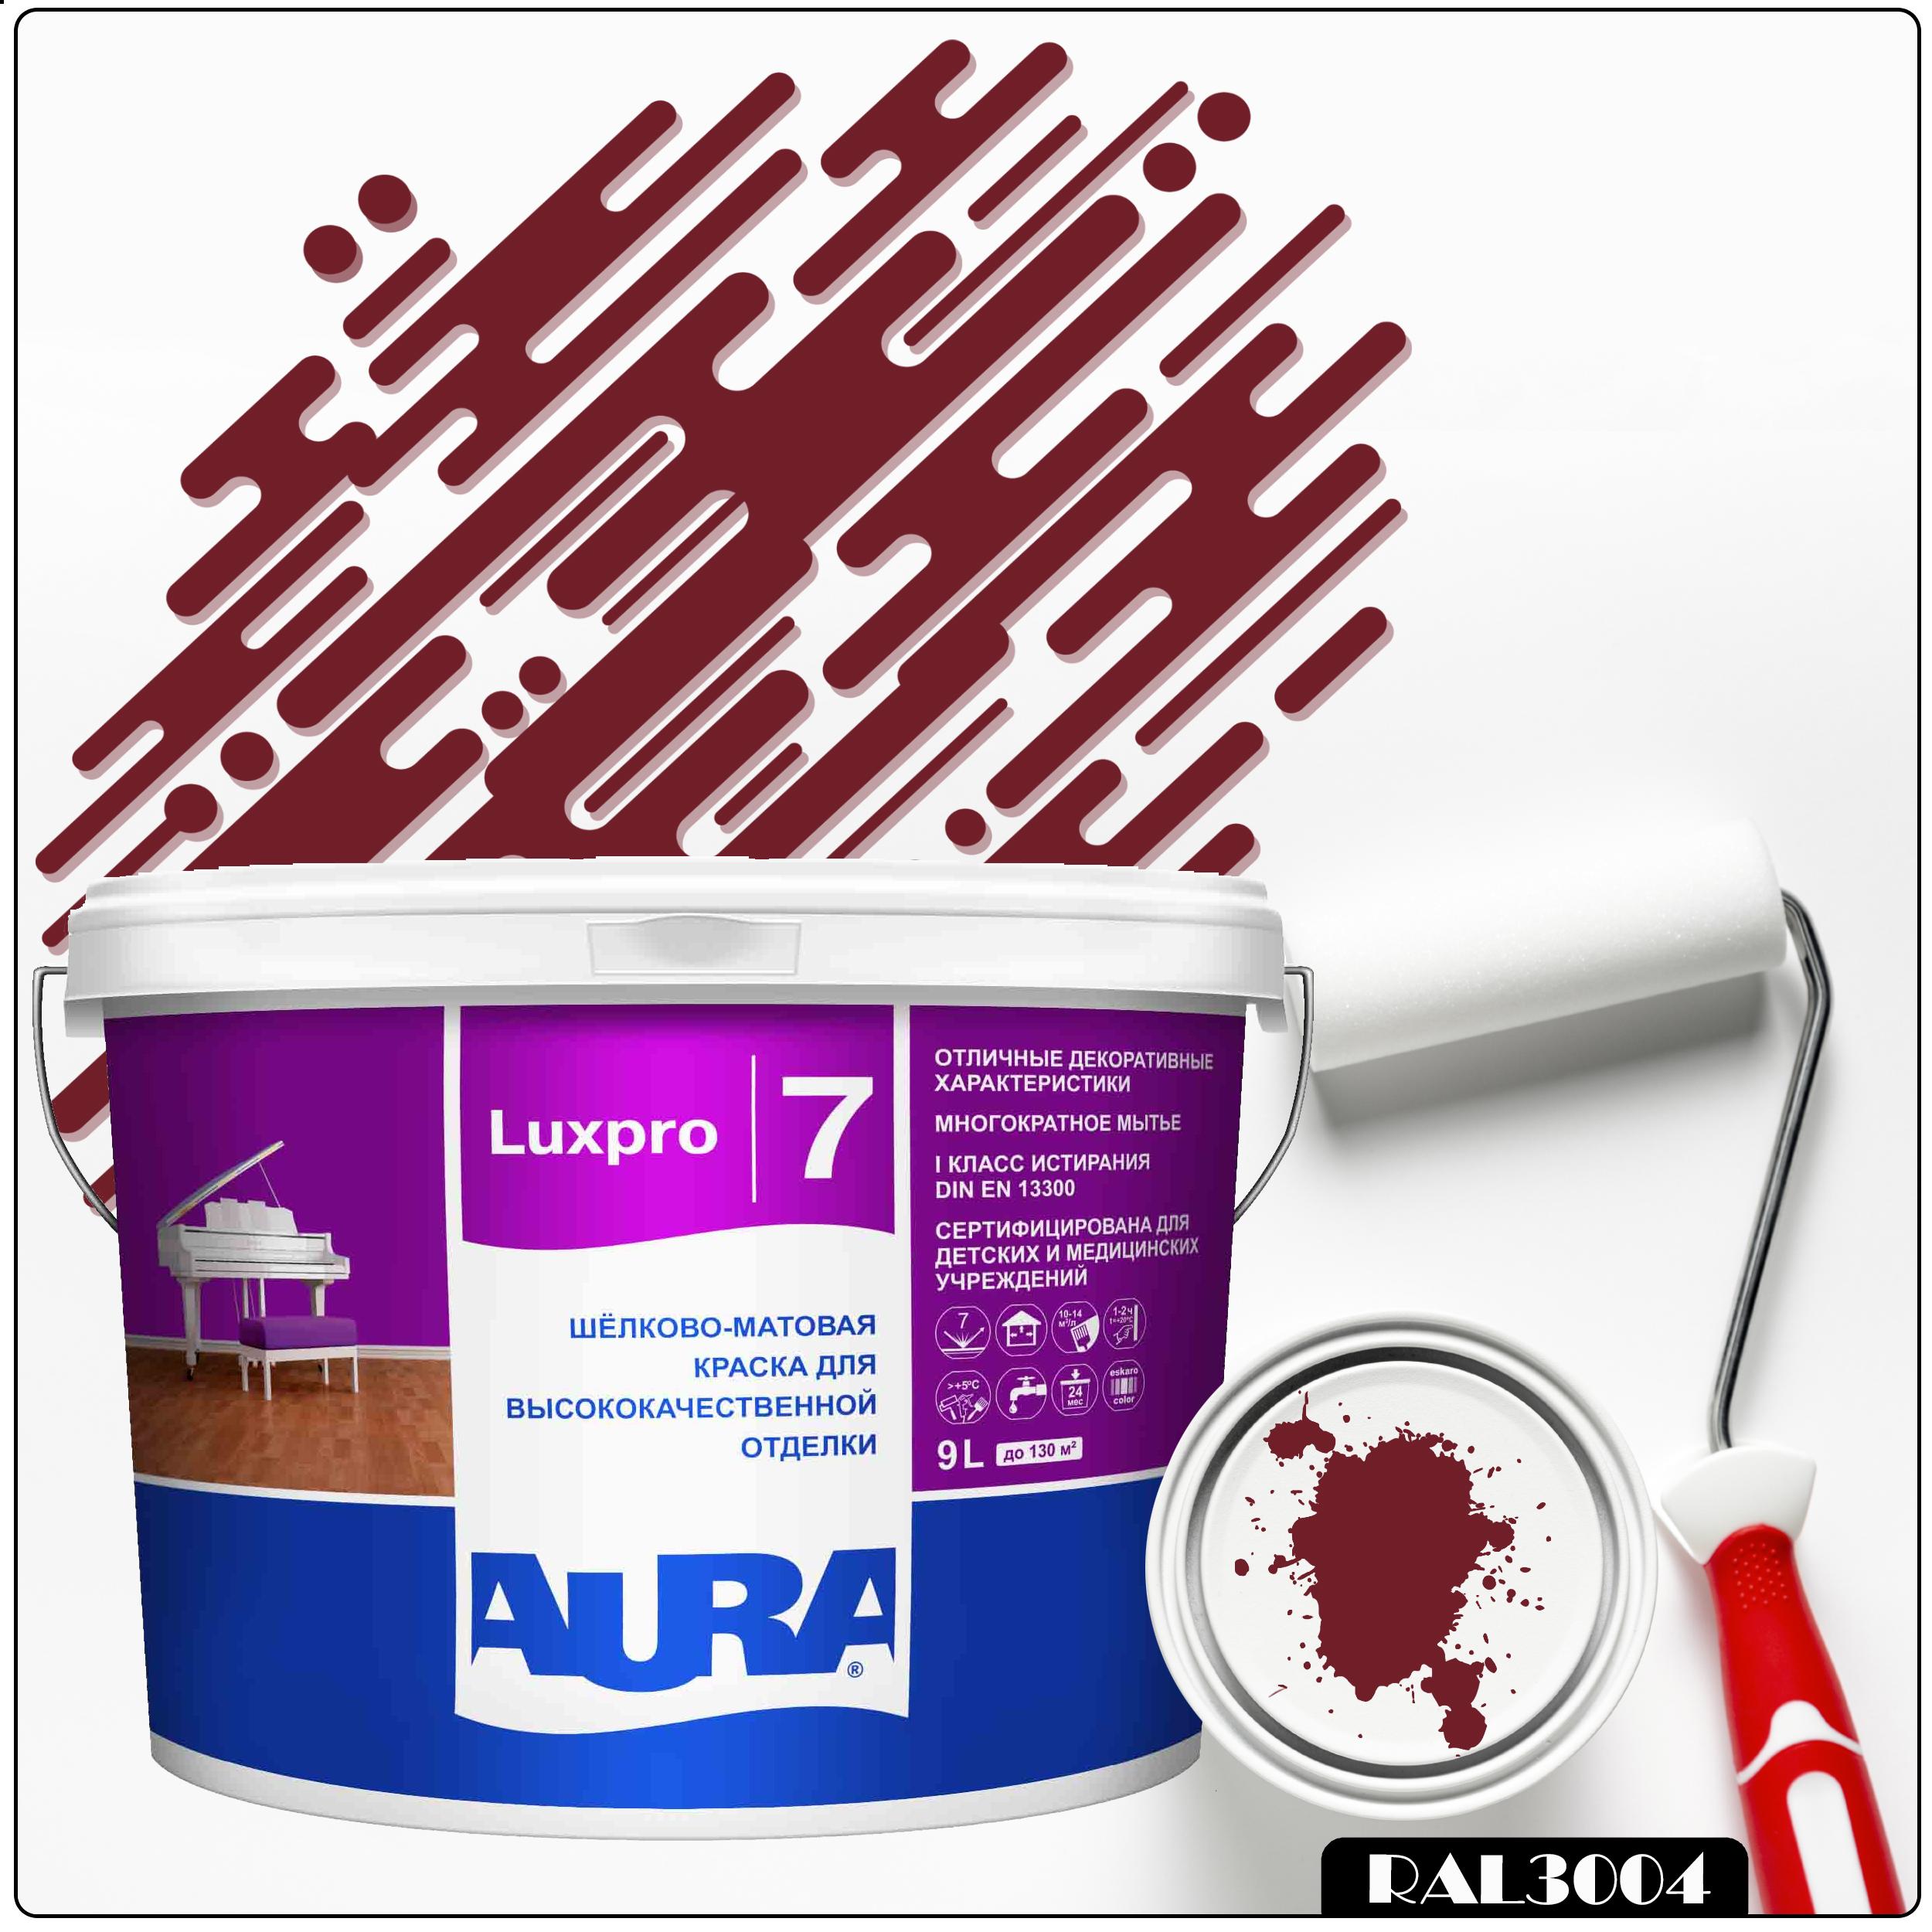 Фото 5 - Краска Aura LuxPRO 7, RAL 3004 Пурпурно-красный, латексная, шелково-матовая, интерьерная, 9л, Аура.